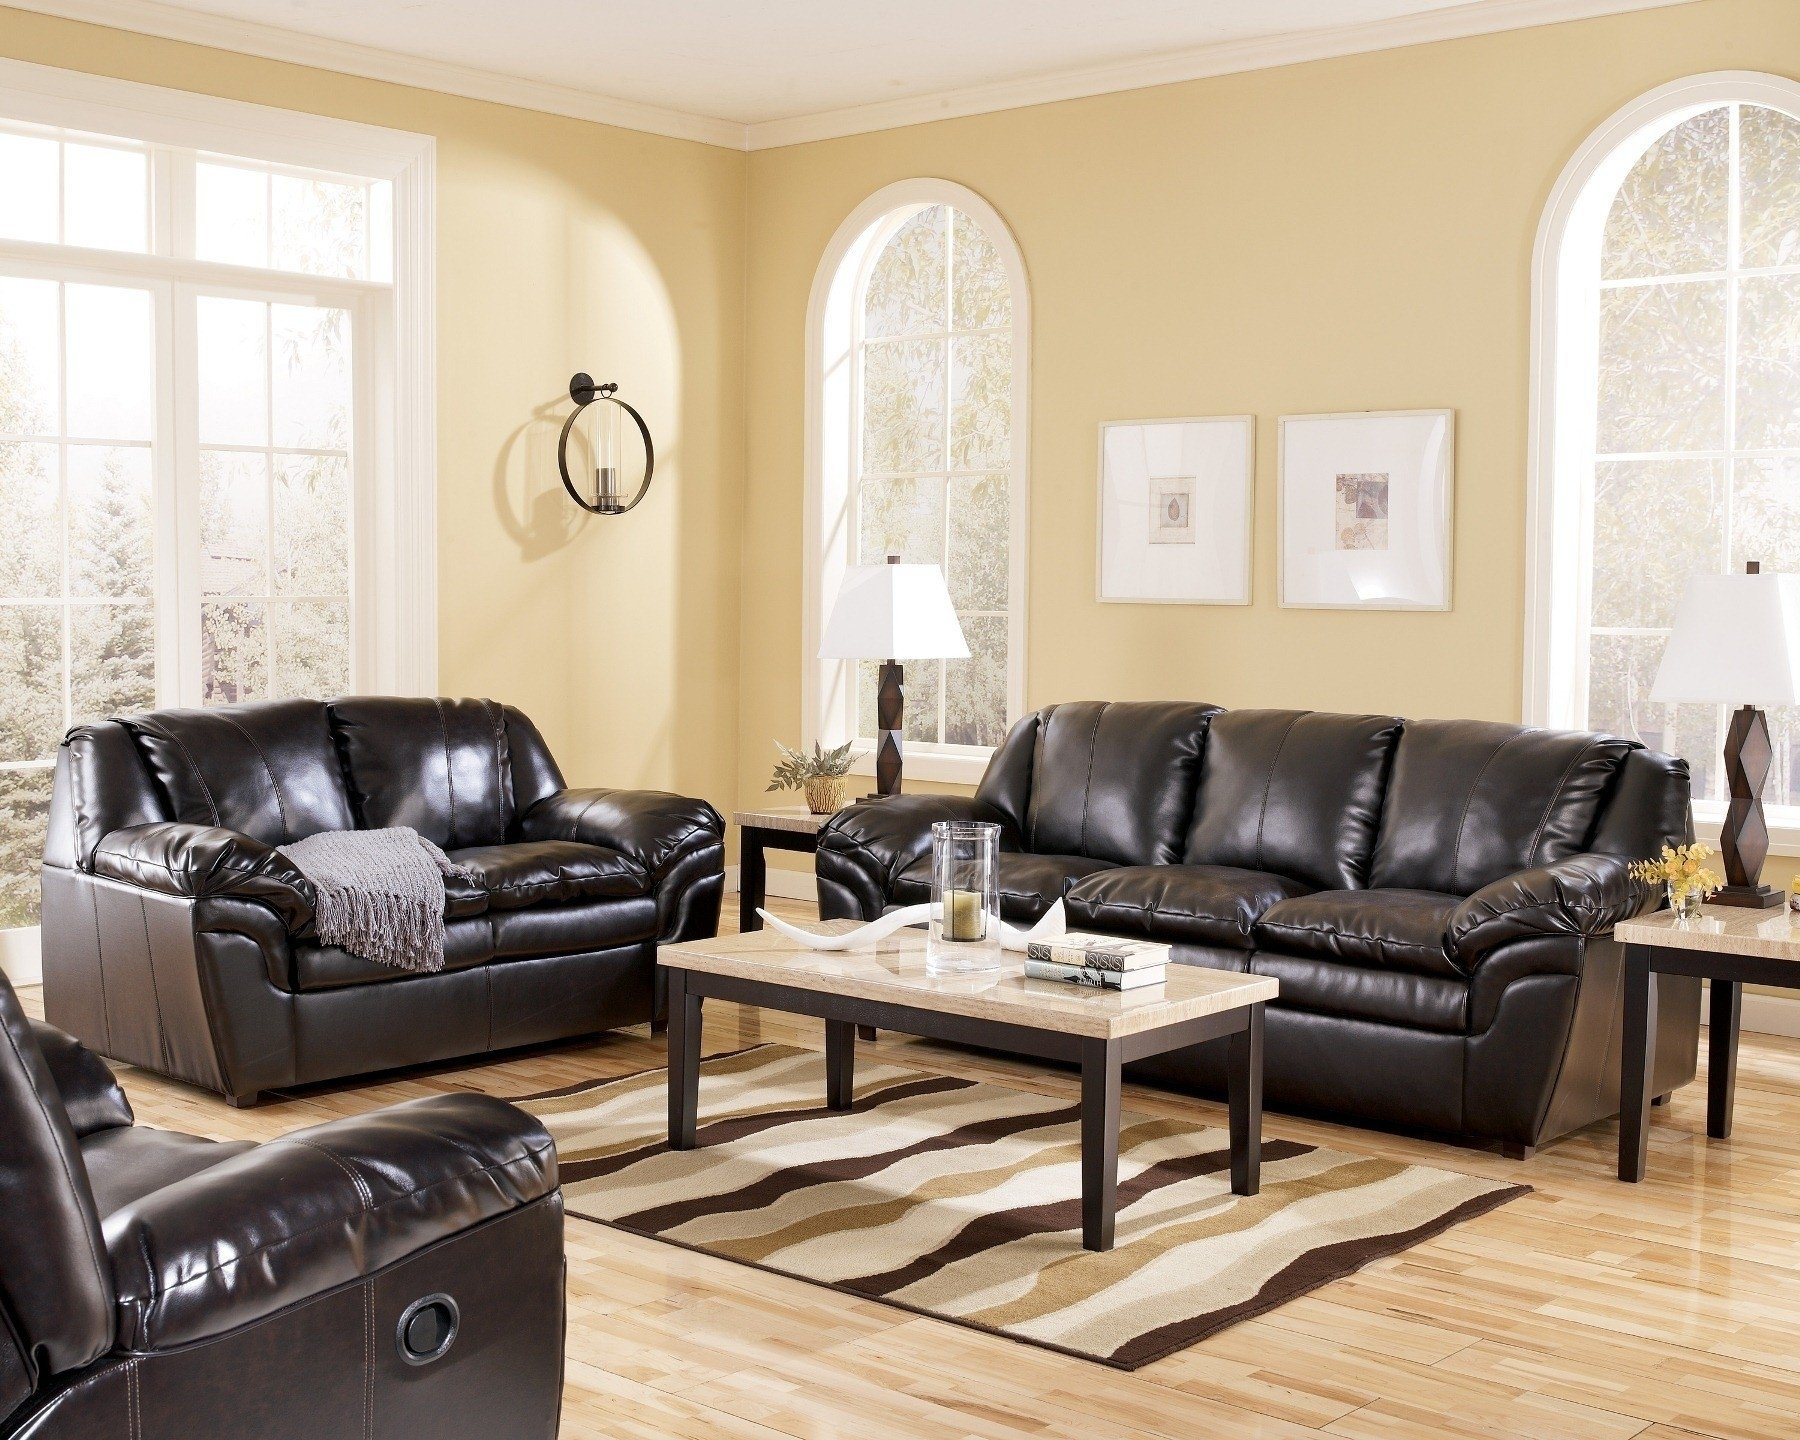 10 Lovable Leather Sofa Living Room Ideas living room living room decorating ideas with brown leather sofa 2021